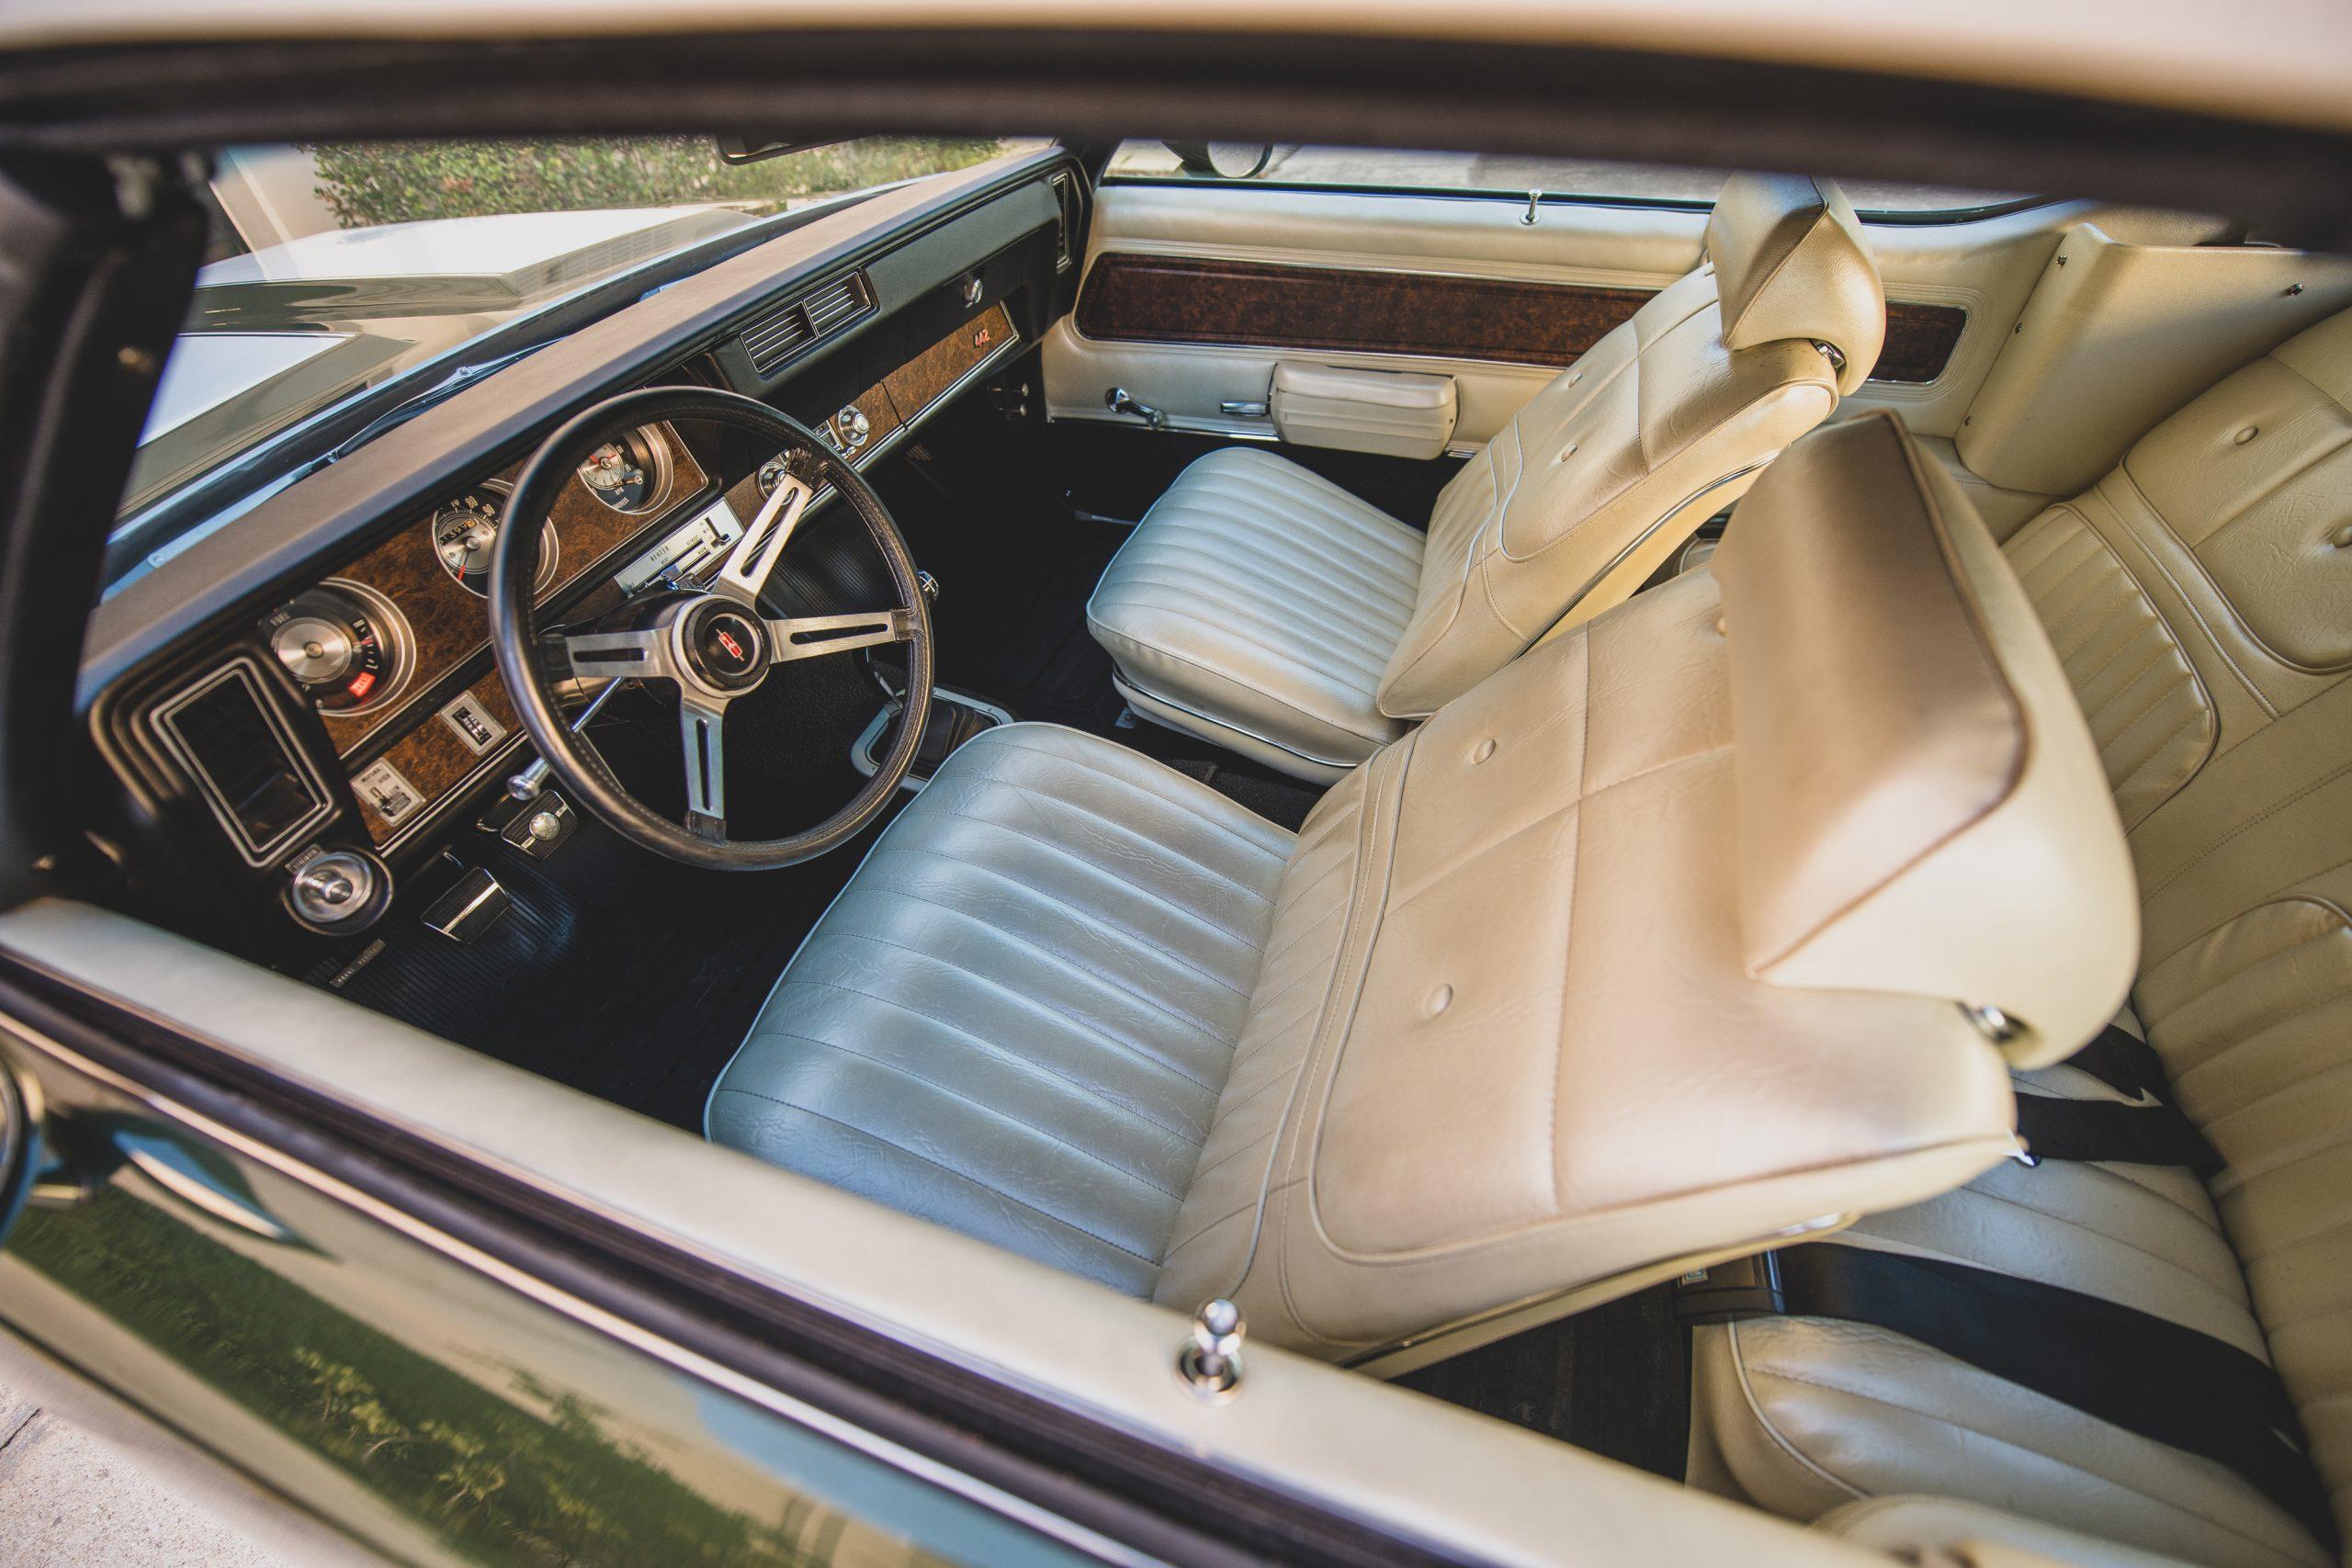 1970 Oldsmobile 442 Convertible Interior